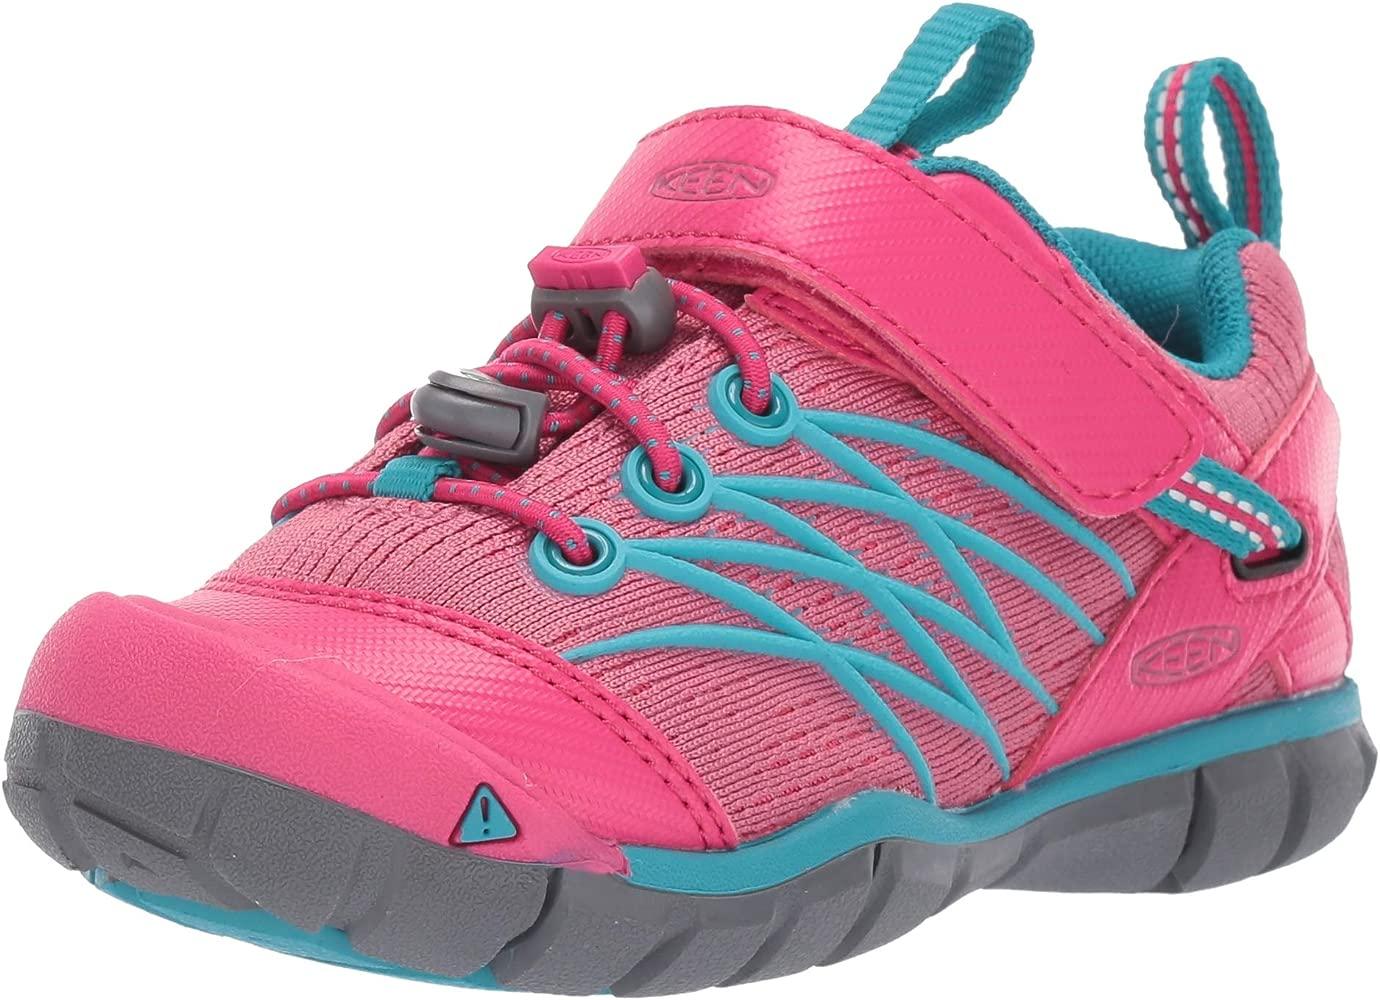 Keen Chandler CNX Waterproof Zapatos de Low Rise Senderismo Unisex Ni/ños